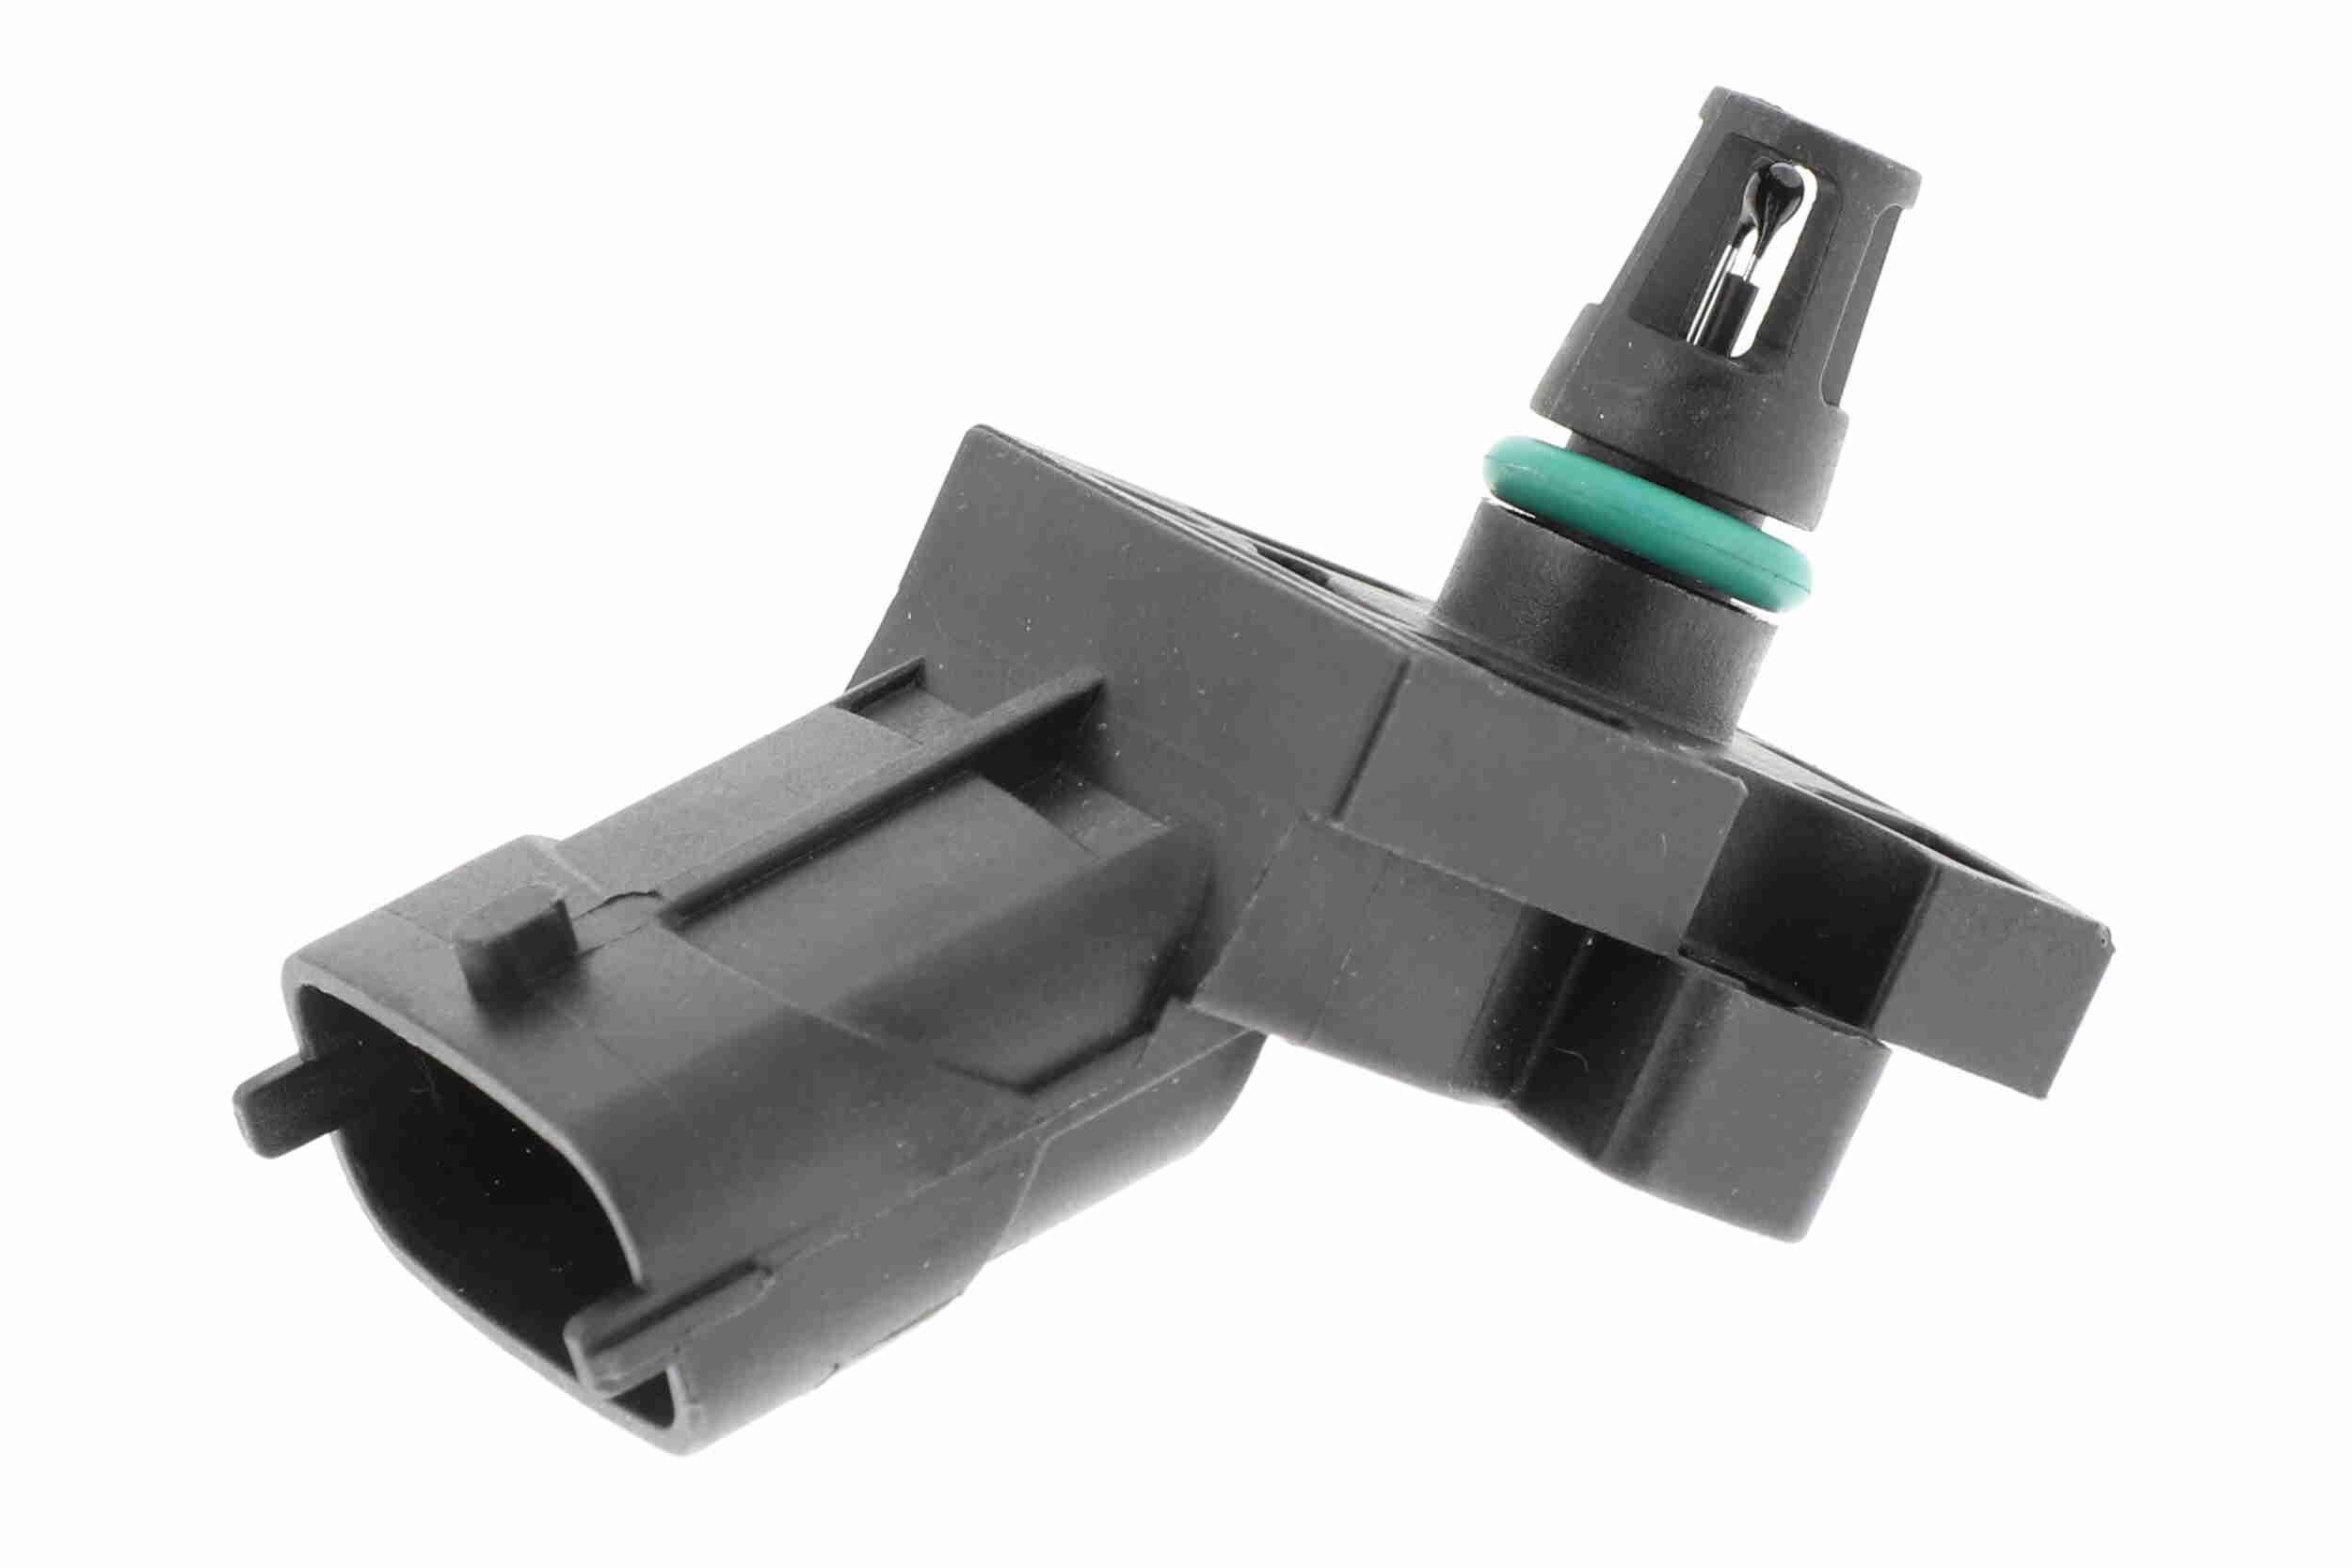 FORD MONDEO 2019 Sensor Ladedruck - Original VEMO V95-72-0046-1 Pol-Anzahl: 4-polig